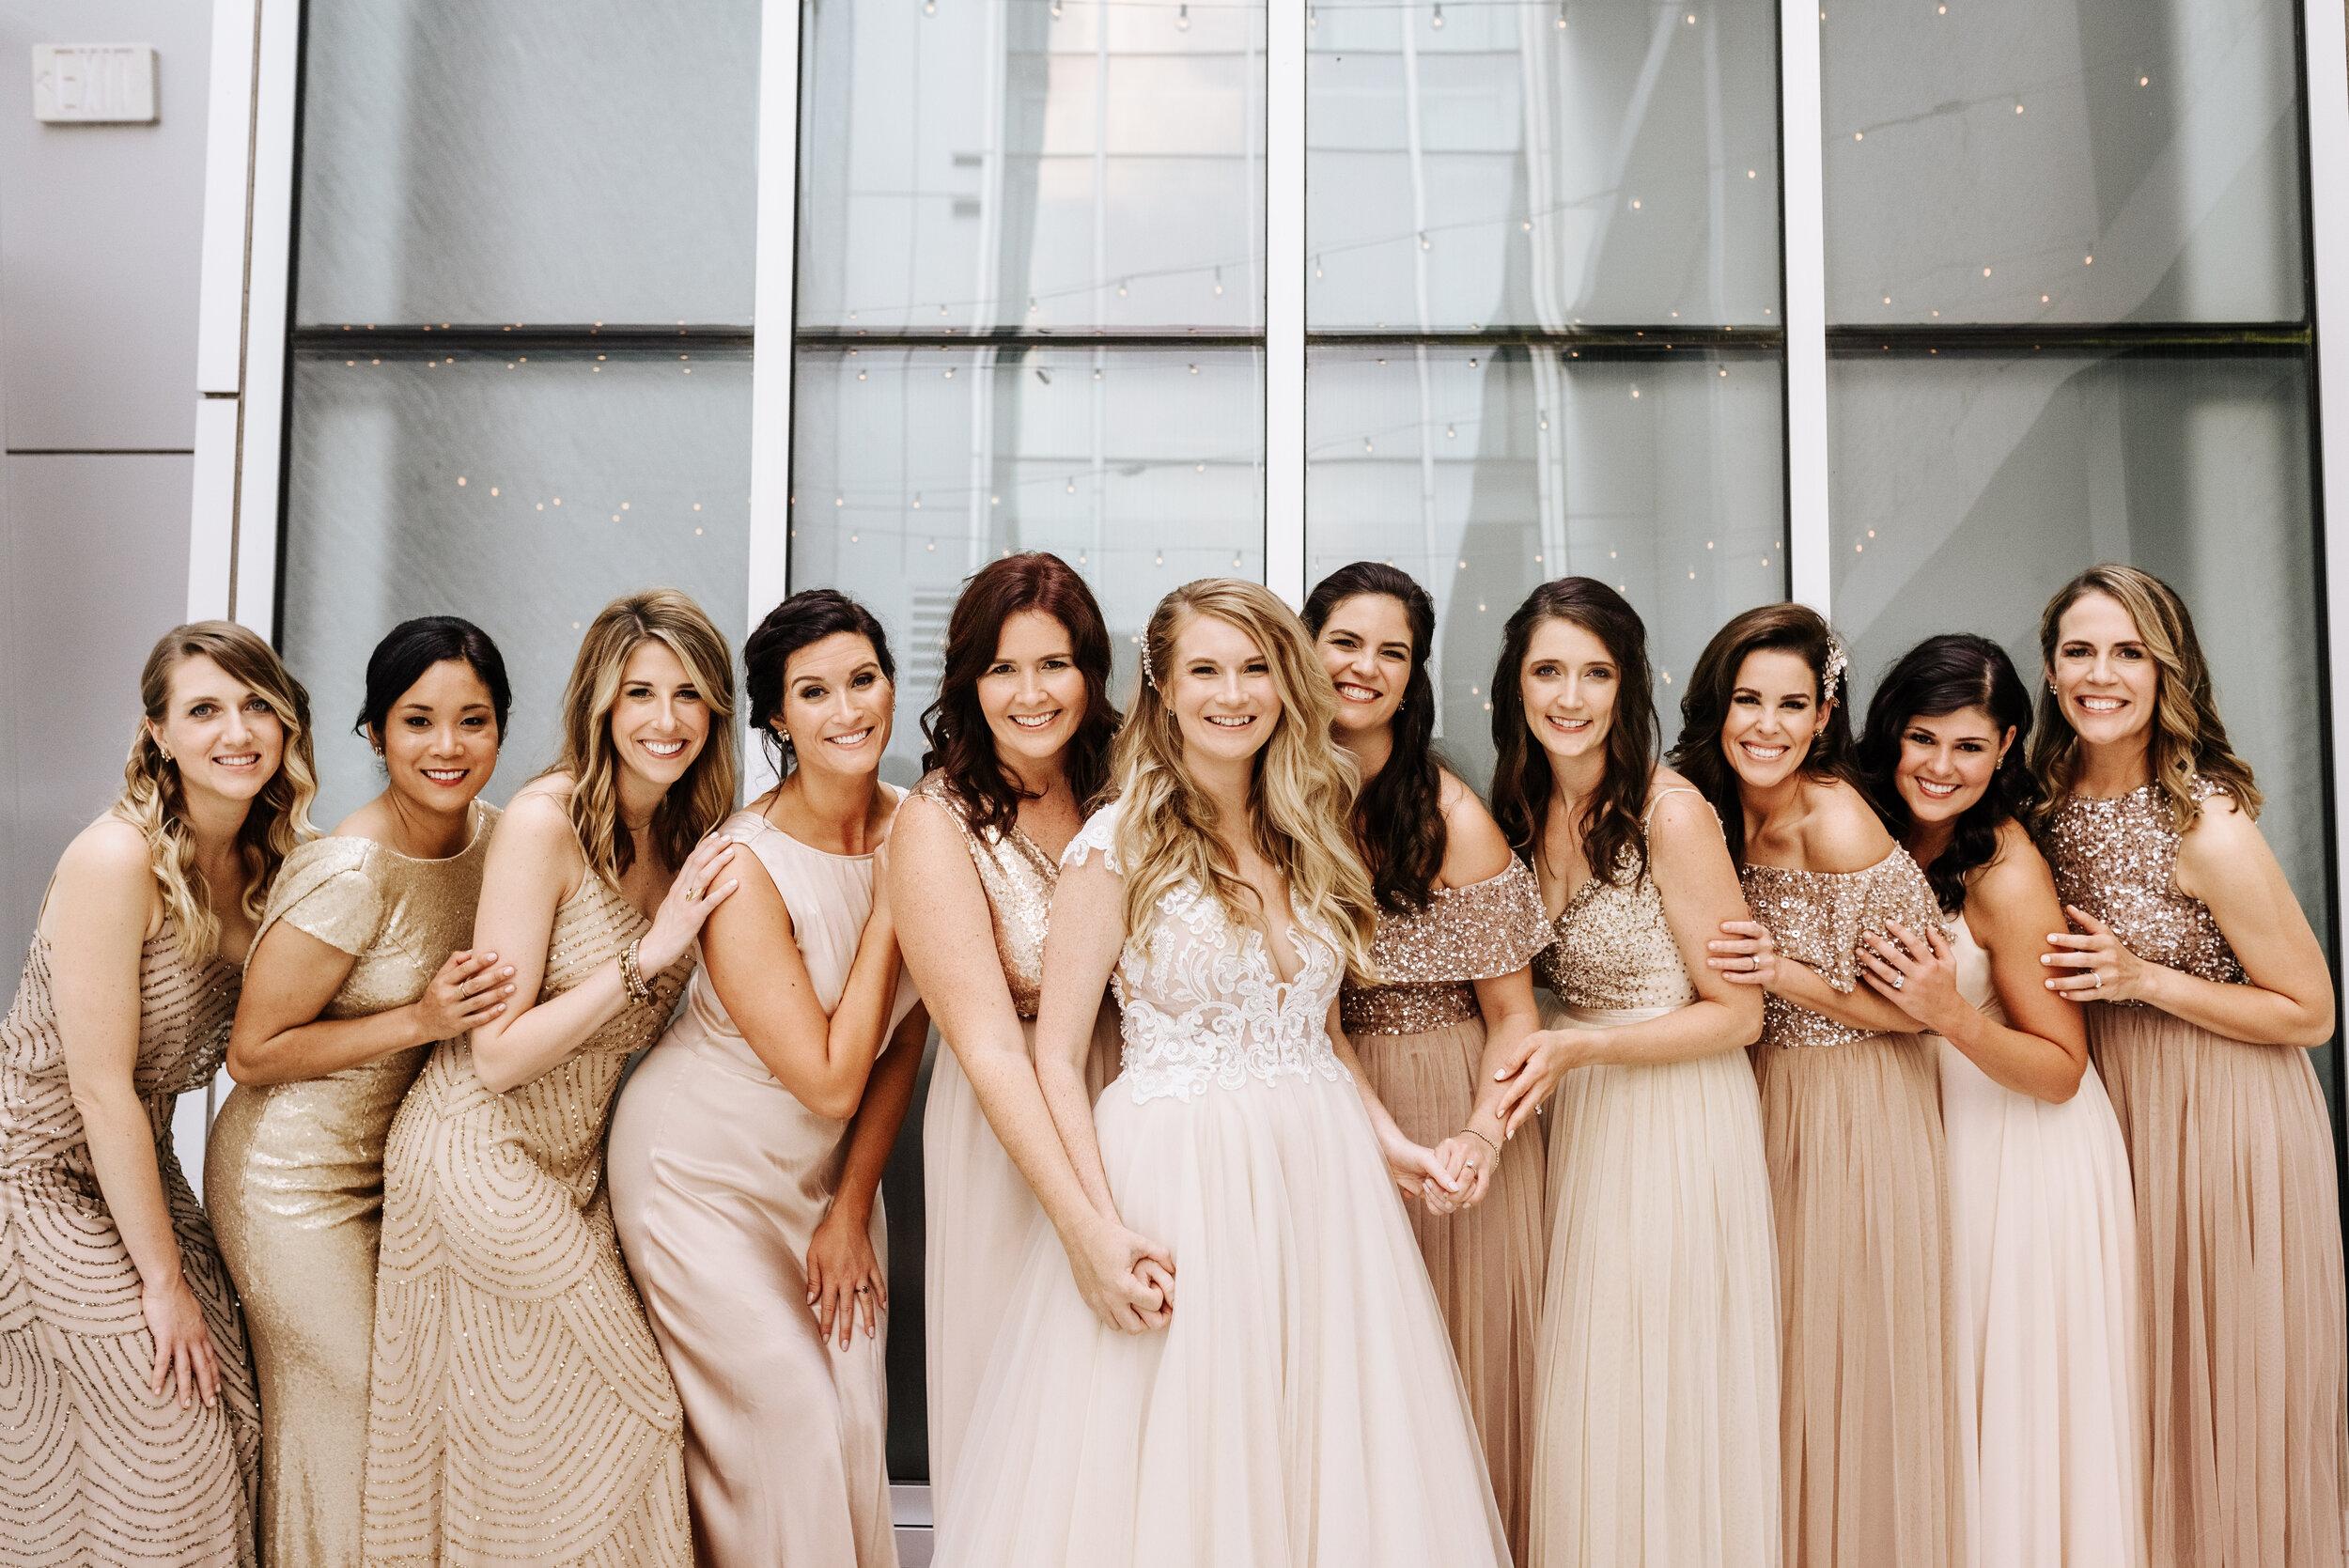 Cassie-Mrunal-Wedding-Quirk-Hotel-John-Marshall-Ballrooms-Richmond-Virginia-Photography-by-V-19.jpg